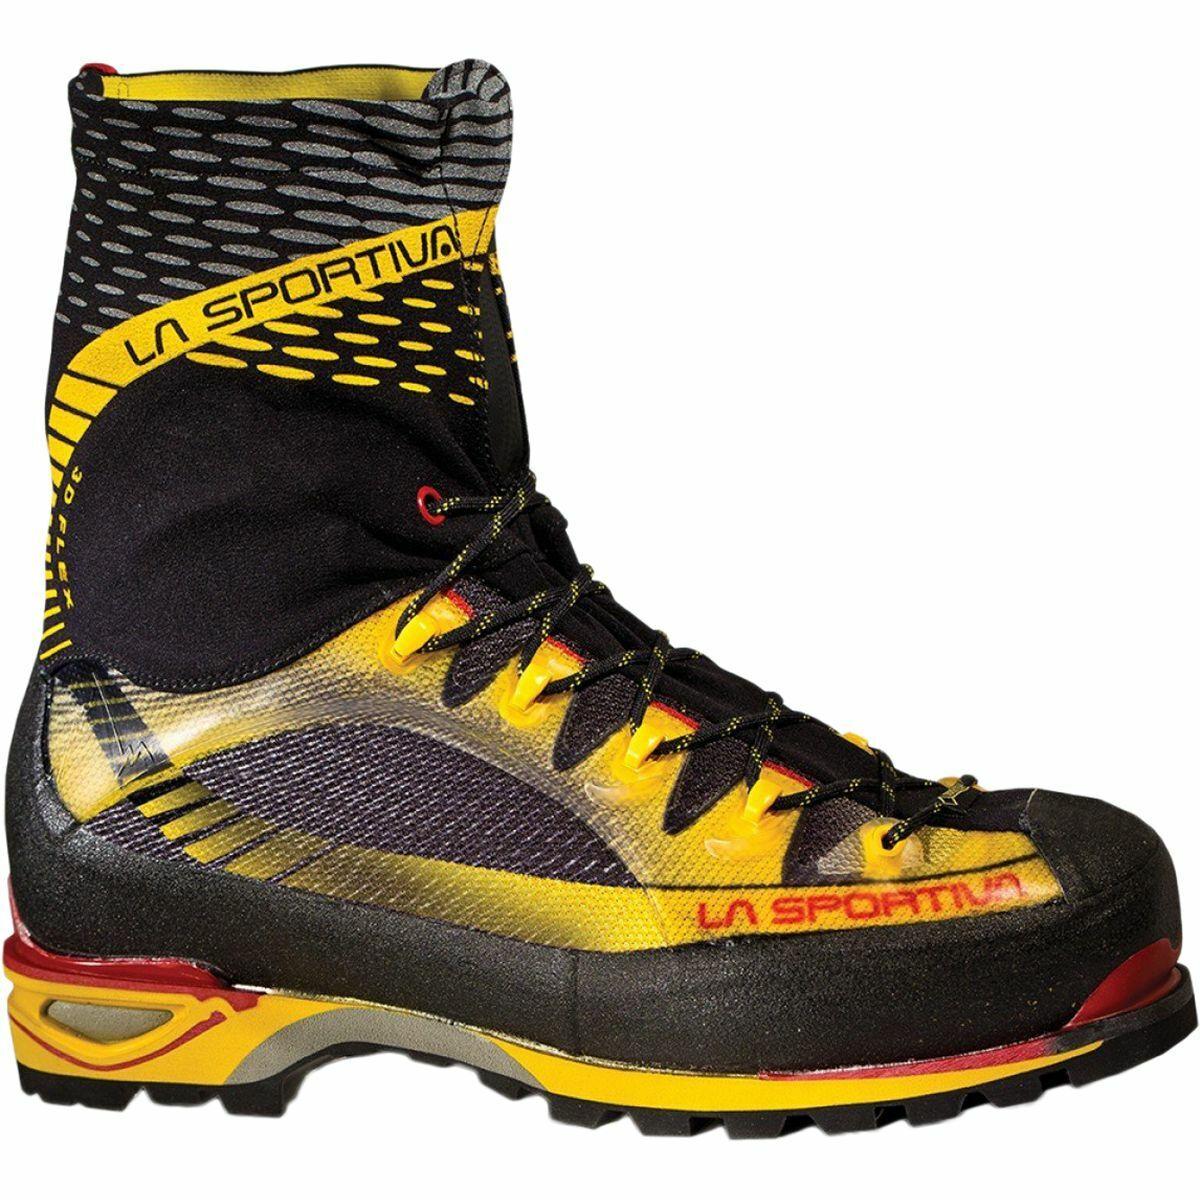 La Sportiva Trango Ice Cube GTX Mountaineering Stiefel 44